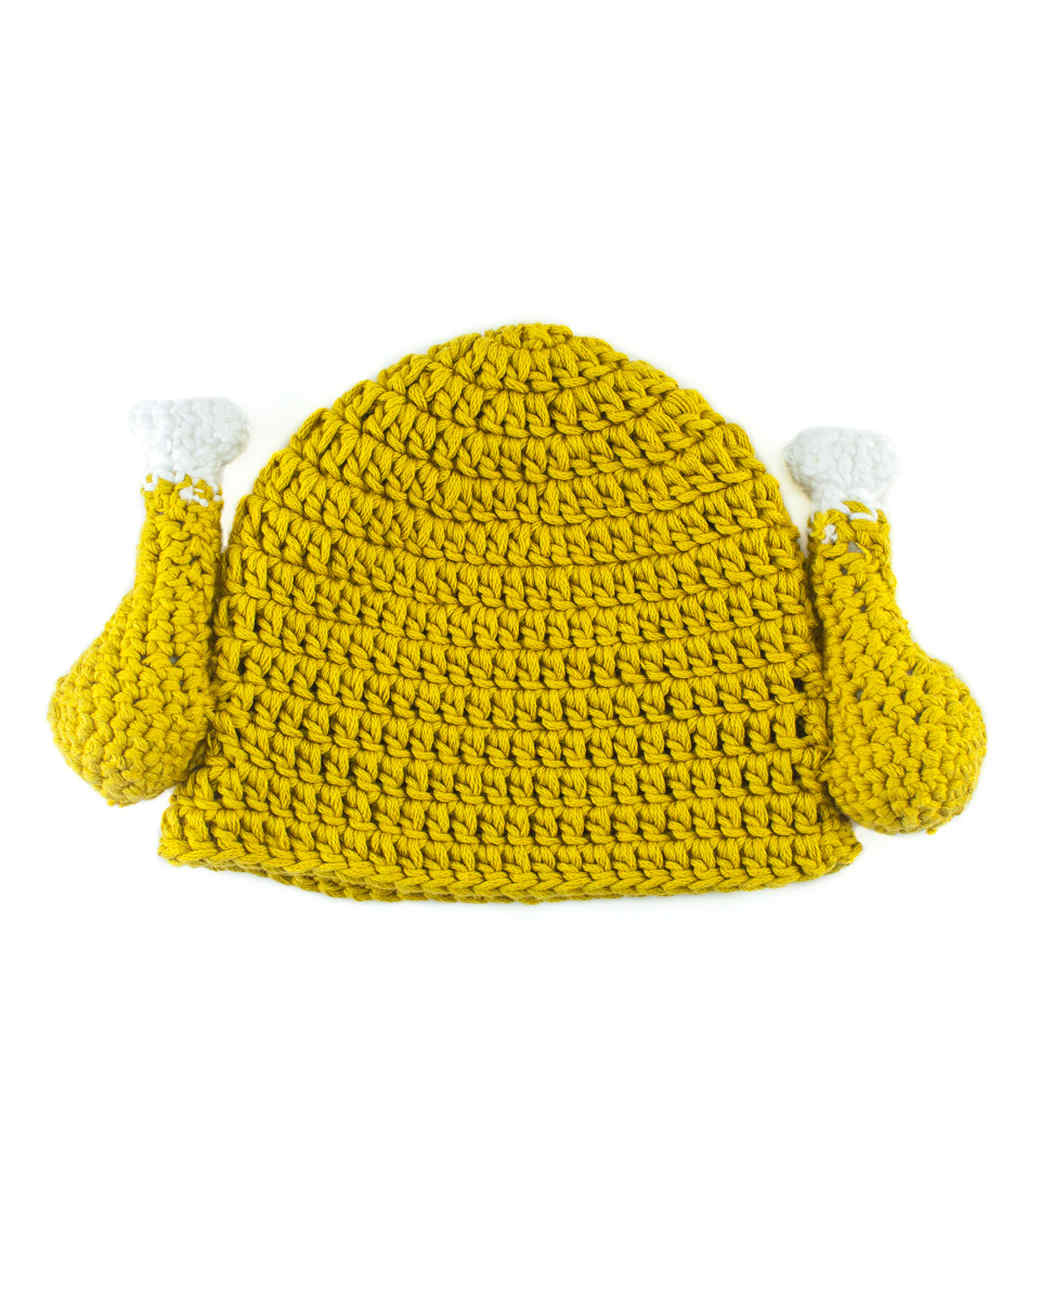 Crocheted turkey hat for Thanksgiving